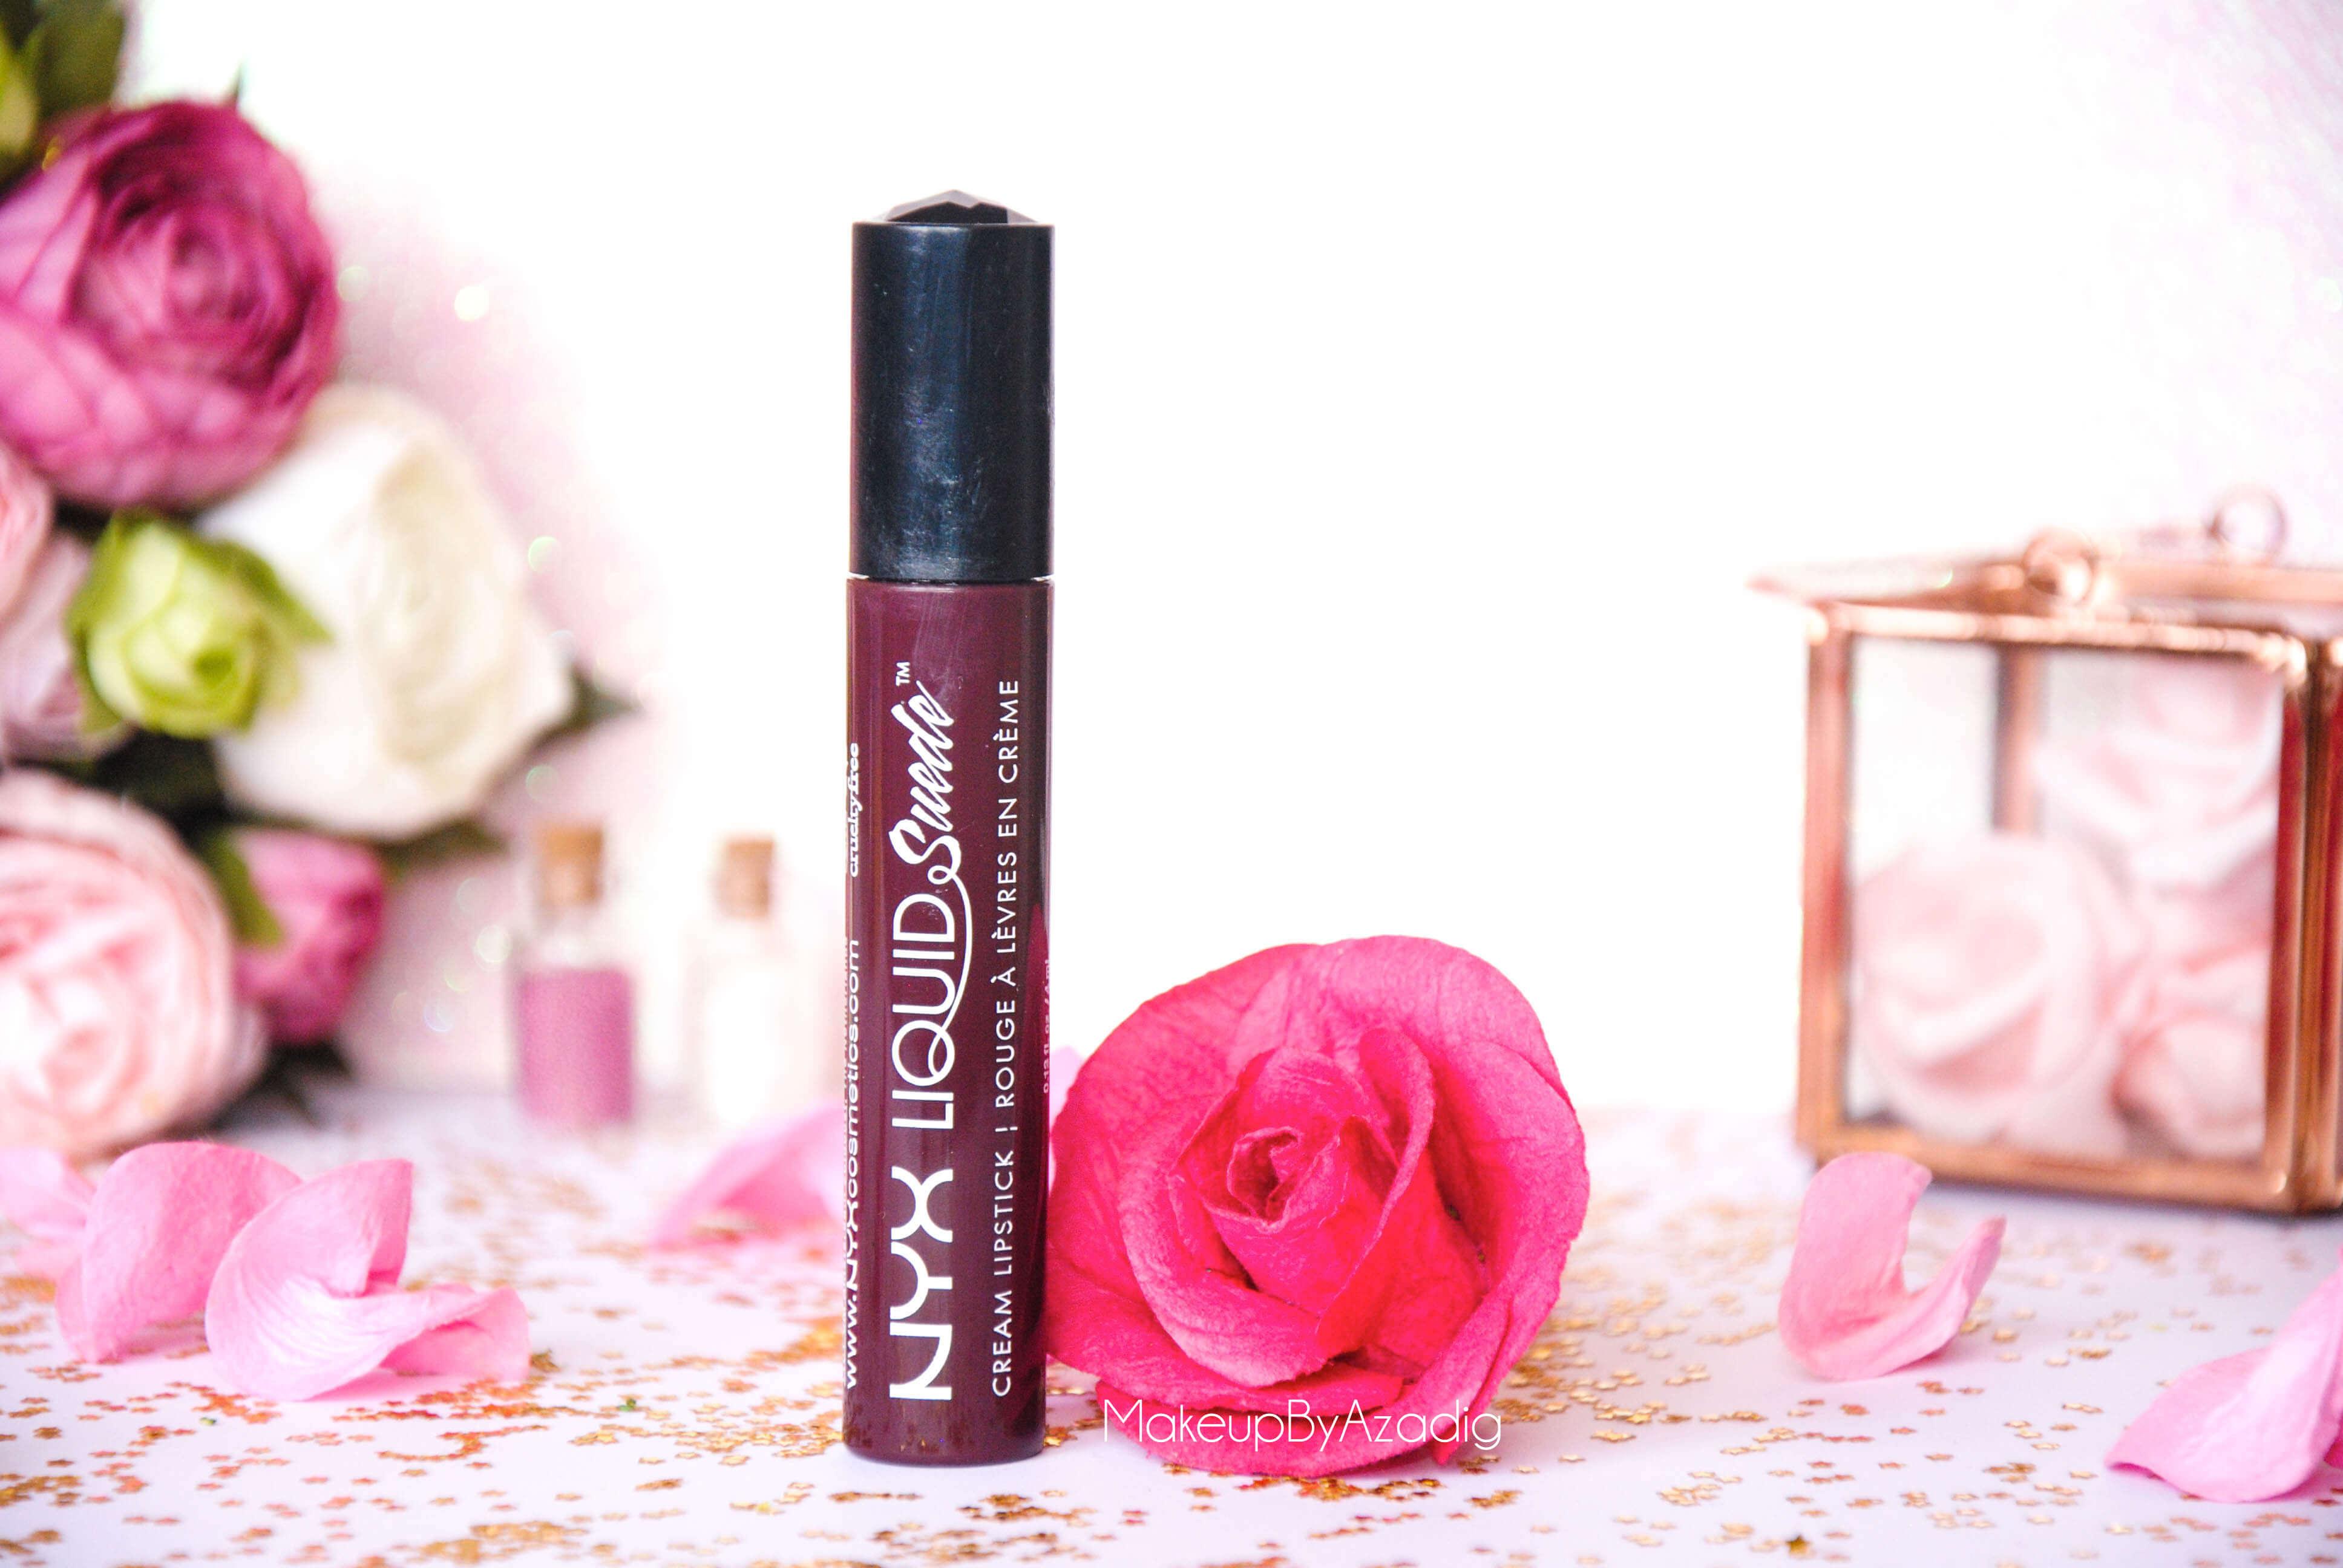 liquid suede-makeupbyazadig-swatch-nyx-cosmetics-pink lust-sway-stone fox-soft spoken-orange cunty-sandstorm-amethyst-lipstick-sway-cherry skies-vintage-mi